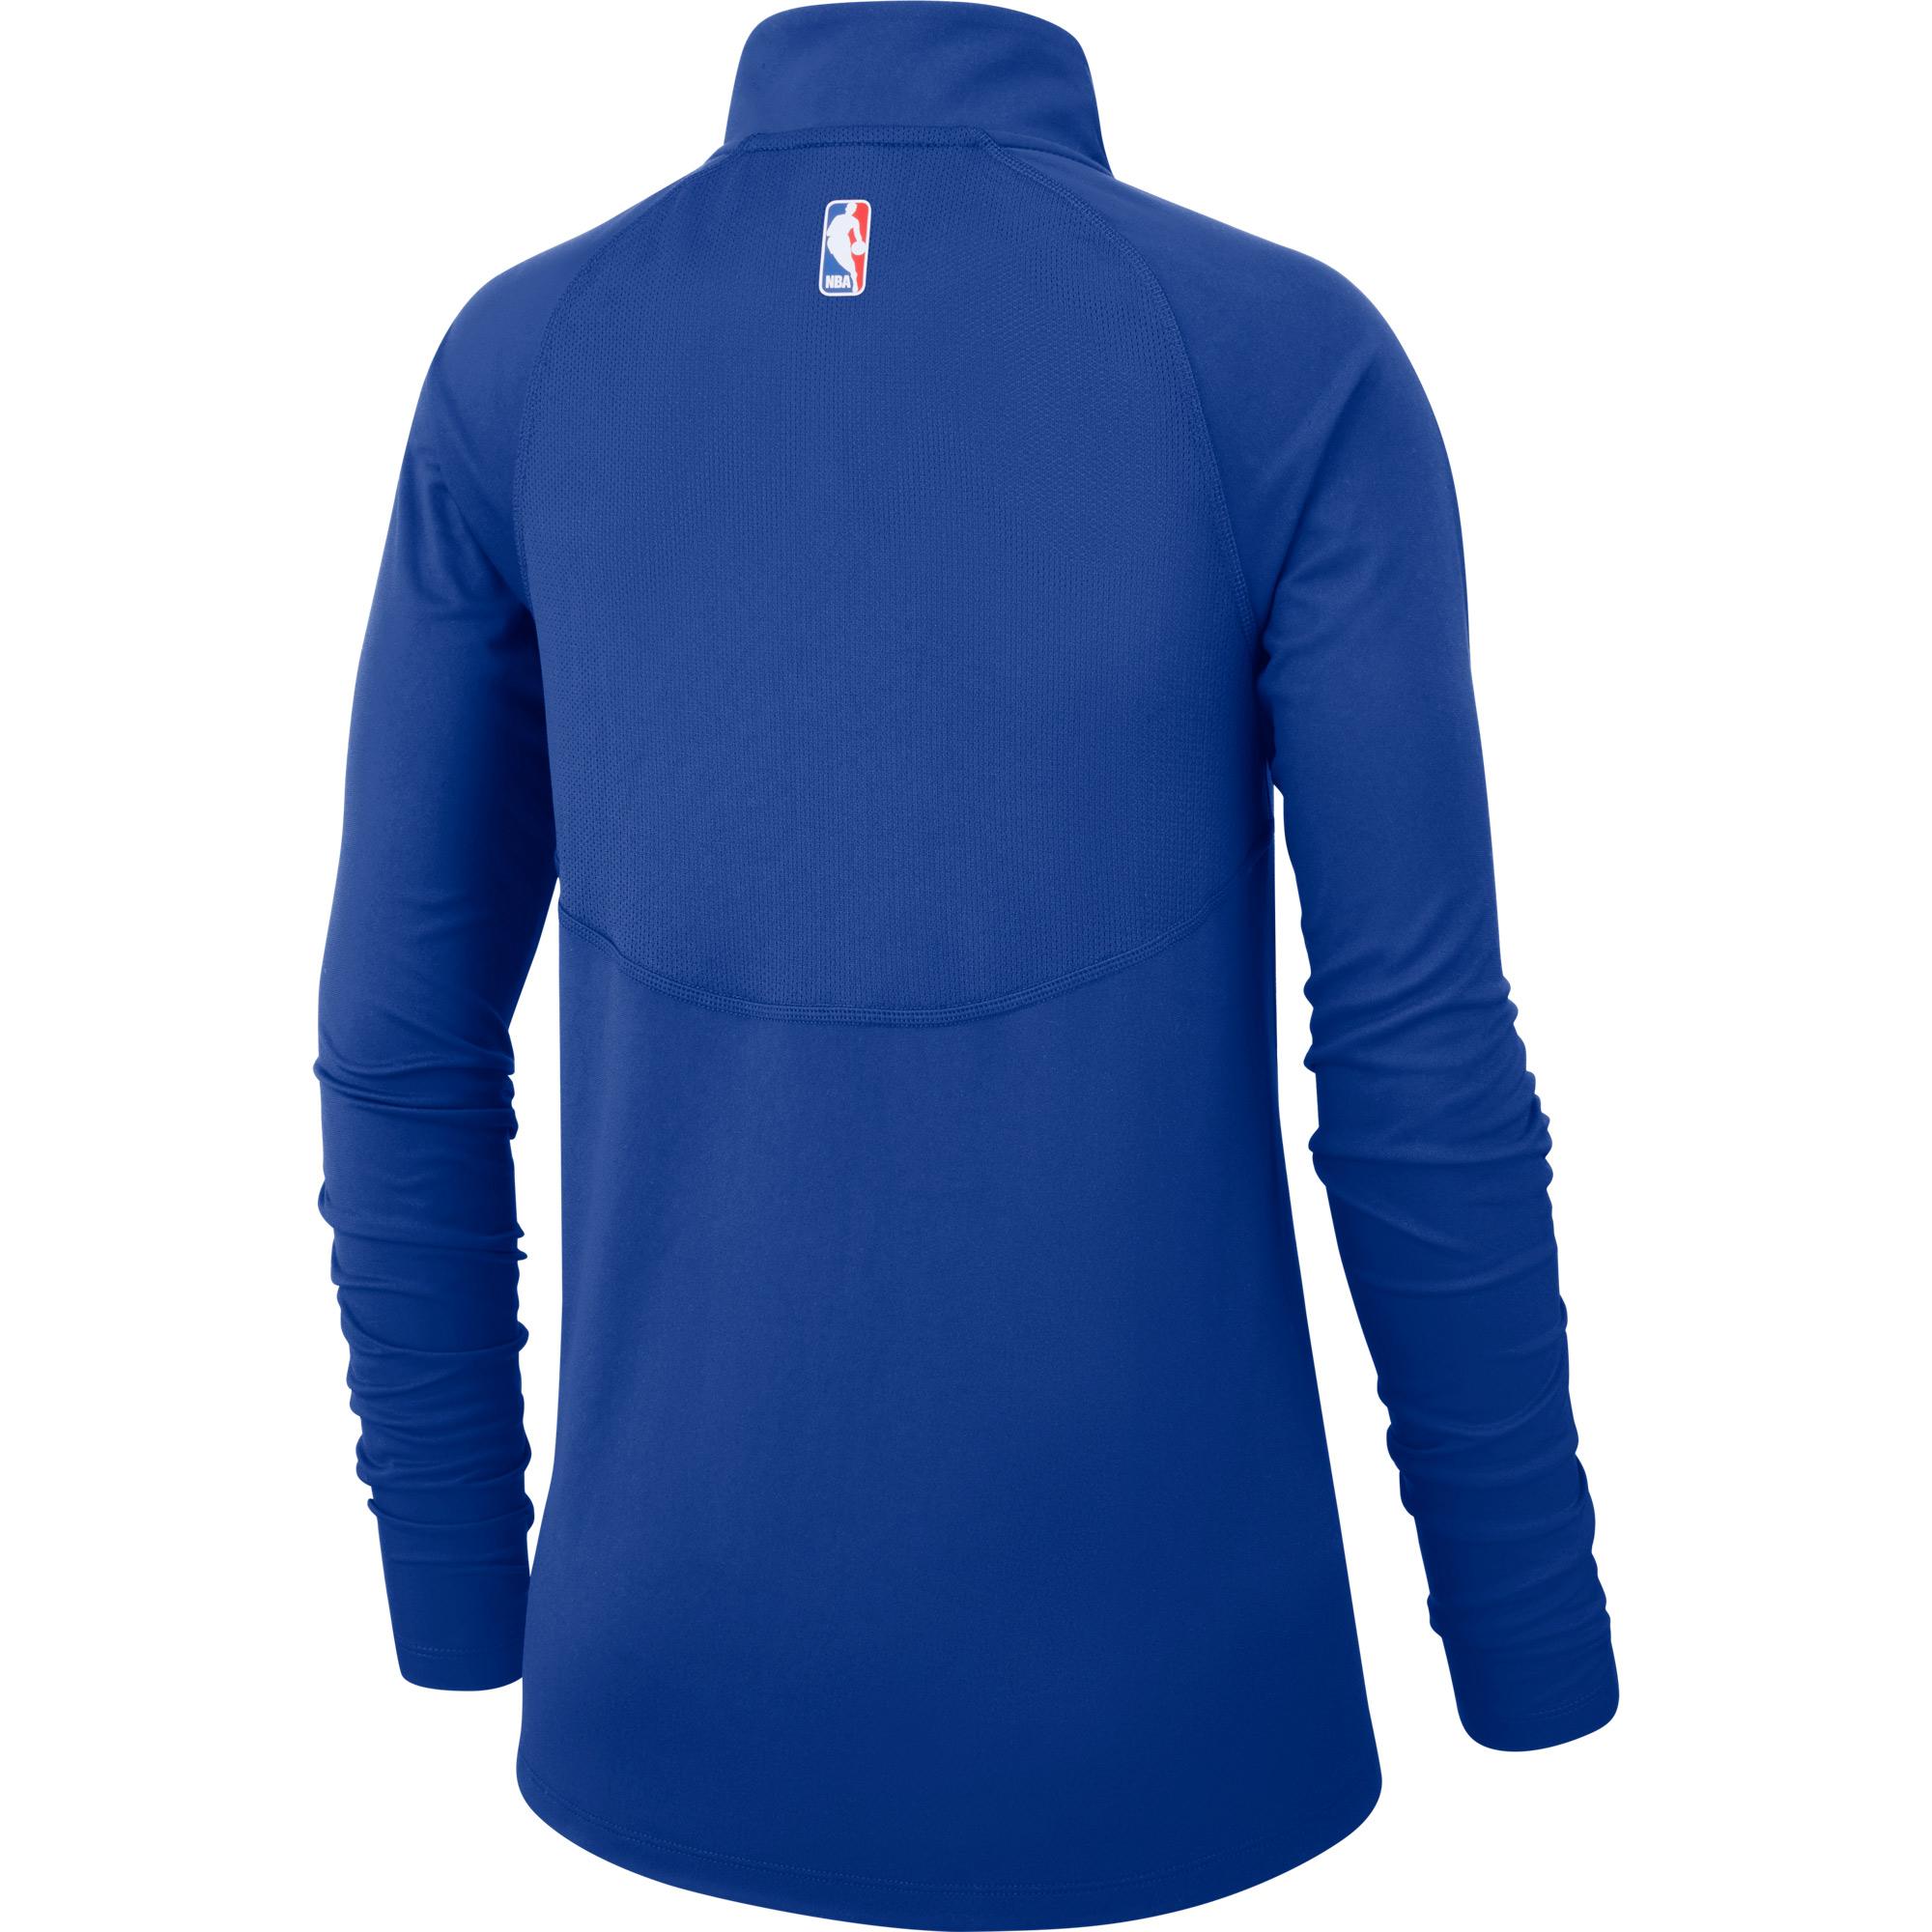 5f73c837df6d Philadelphia 76ers Nike Women s Element Performance Raglan Sleeve Half-Zip  Pullover Jacket - Royal - Walmart.com